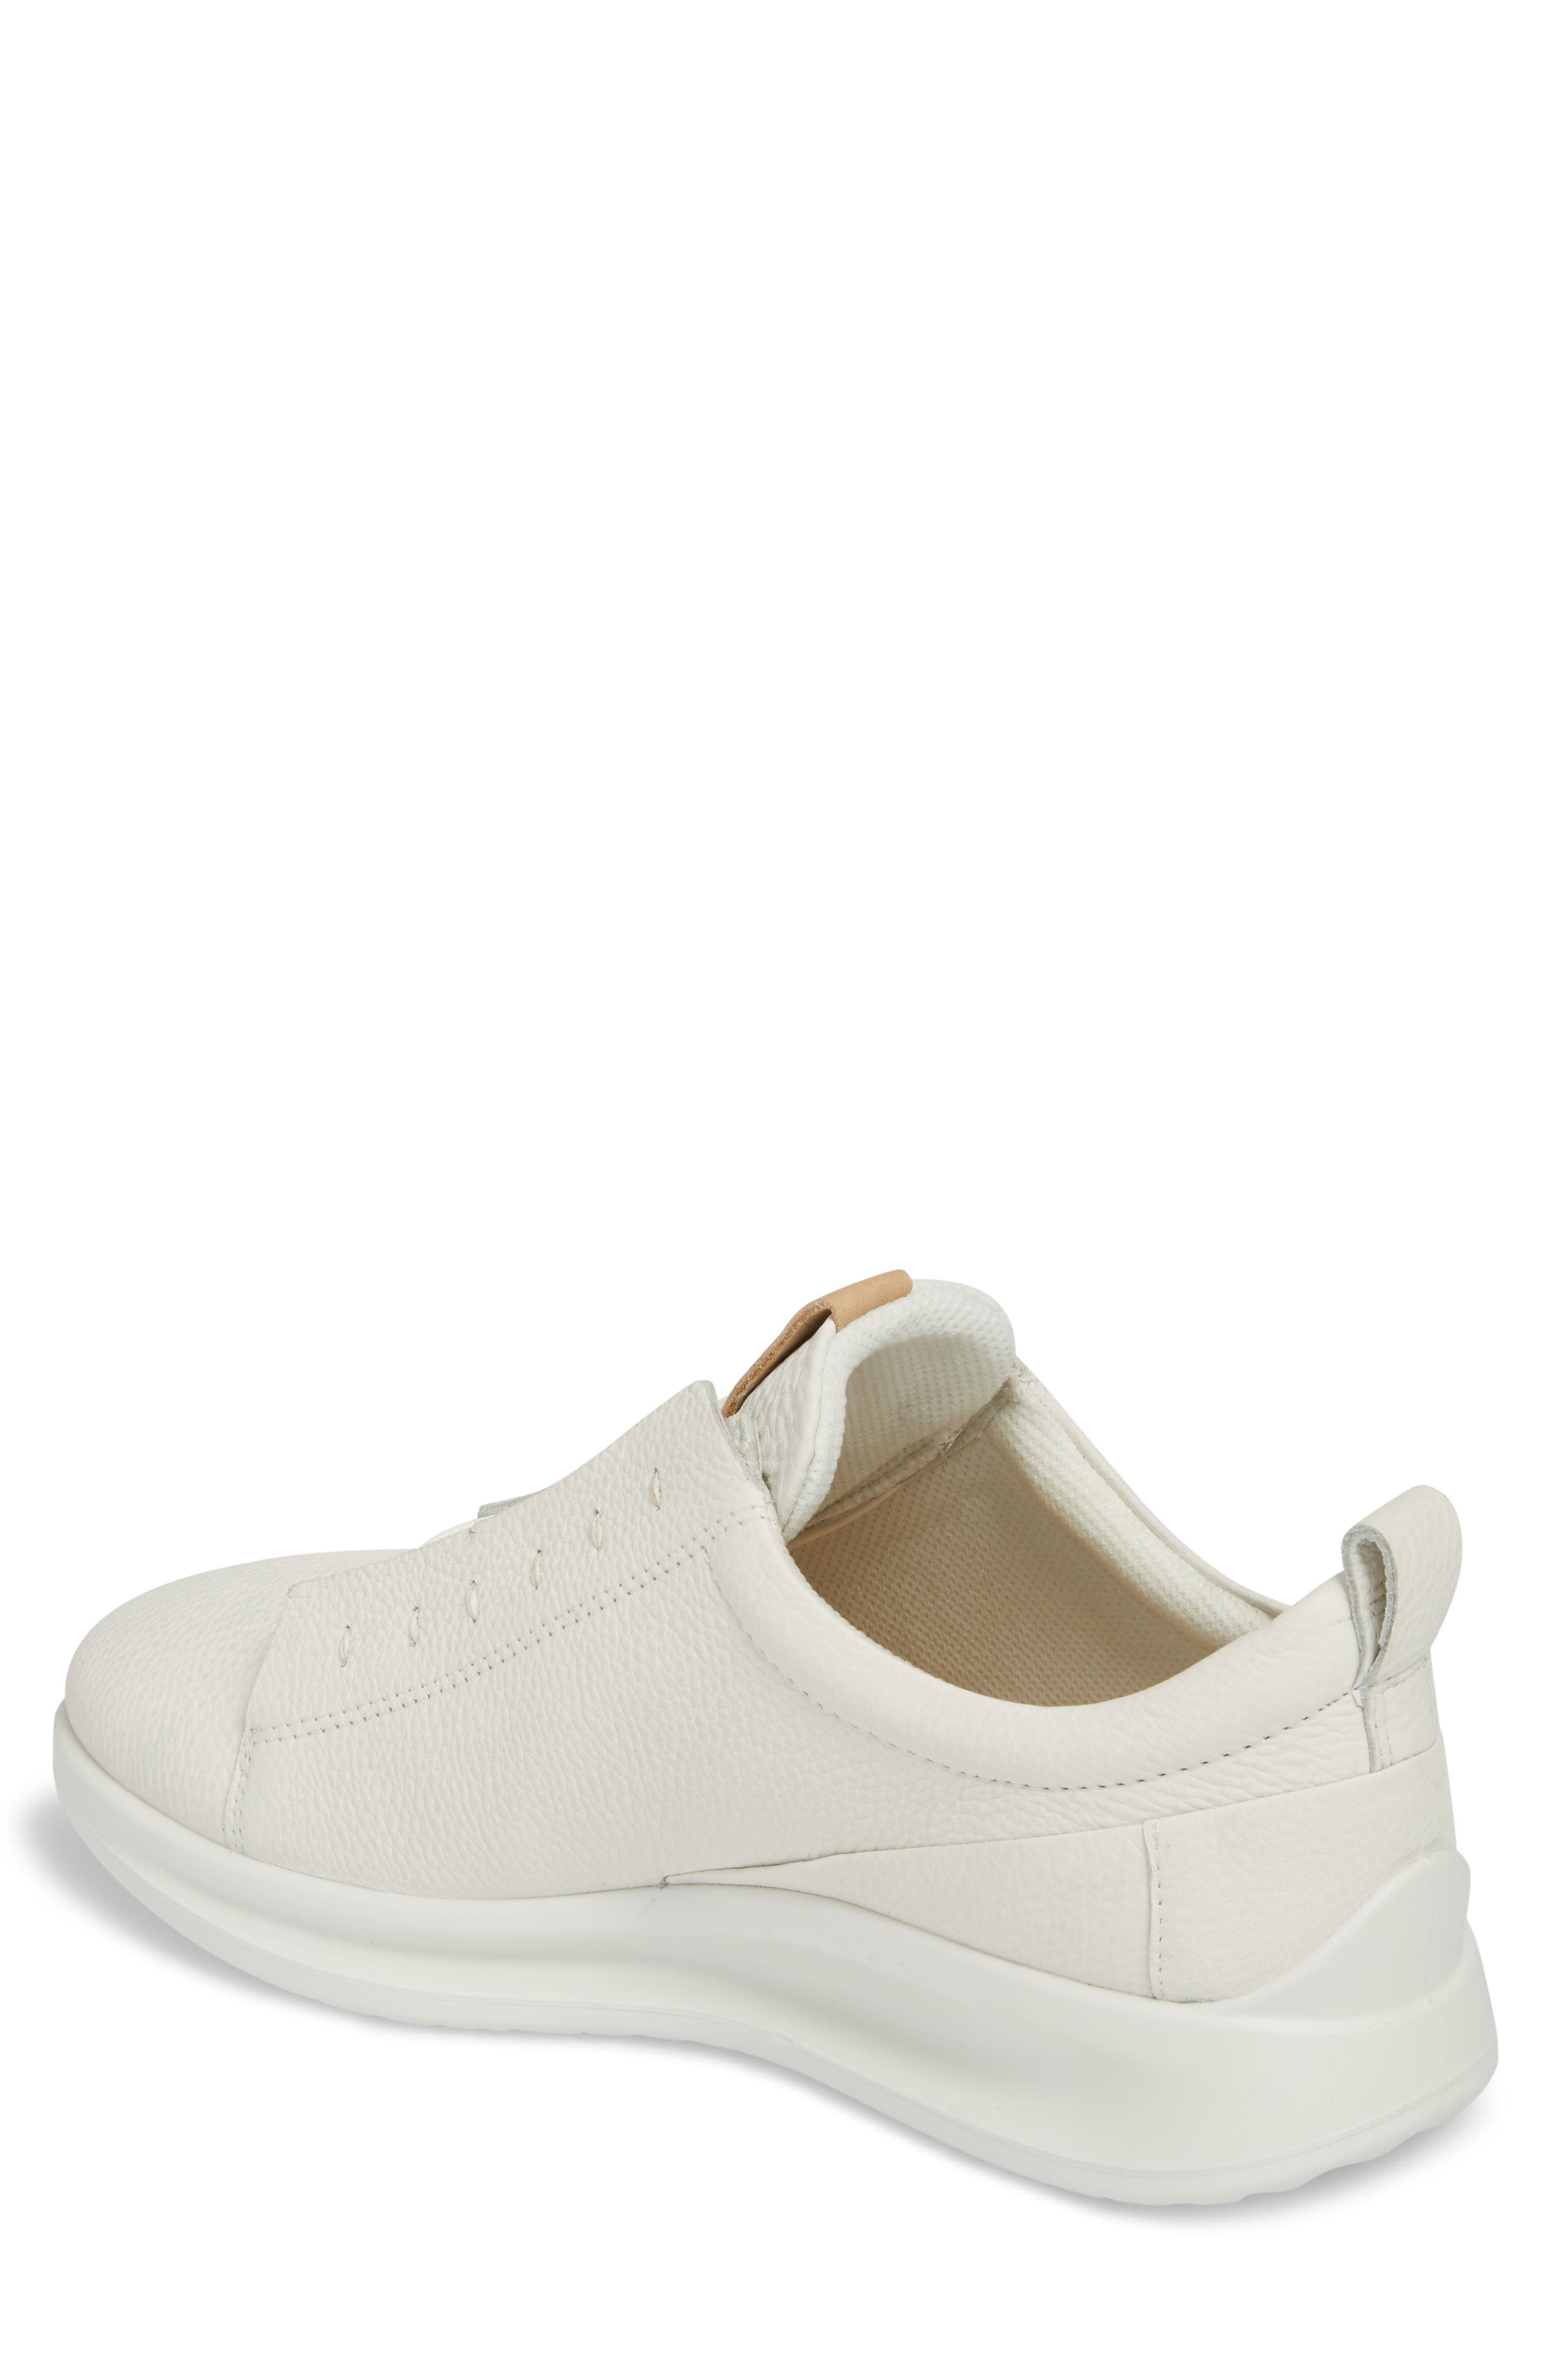 Aquet Low Top Sneaker,                             Alternate thumbnail 2, color,                             White Leather